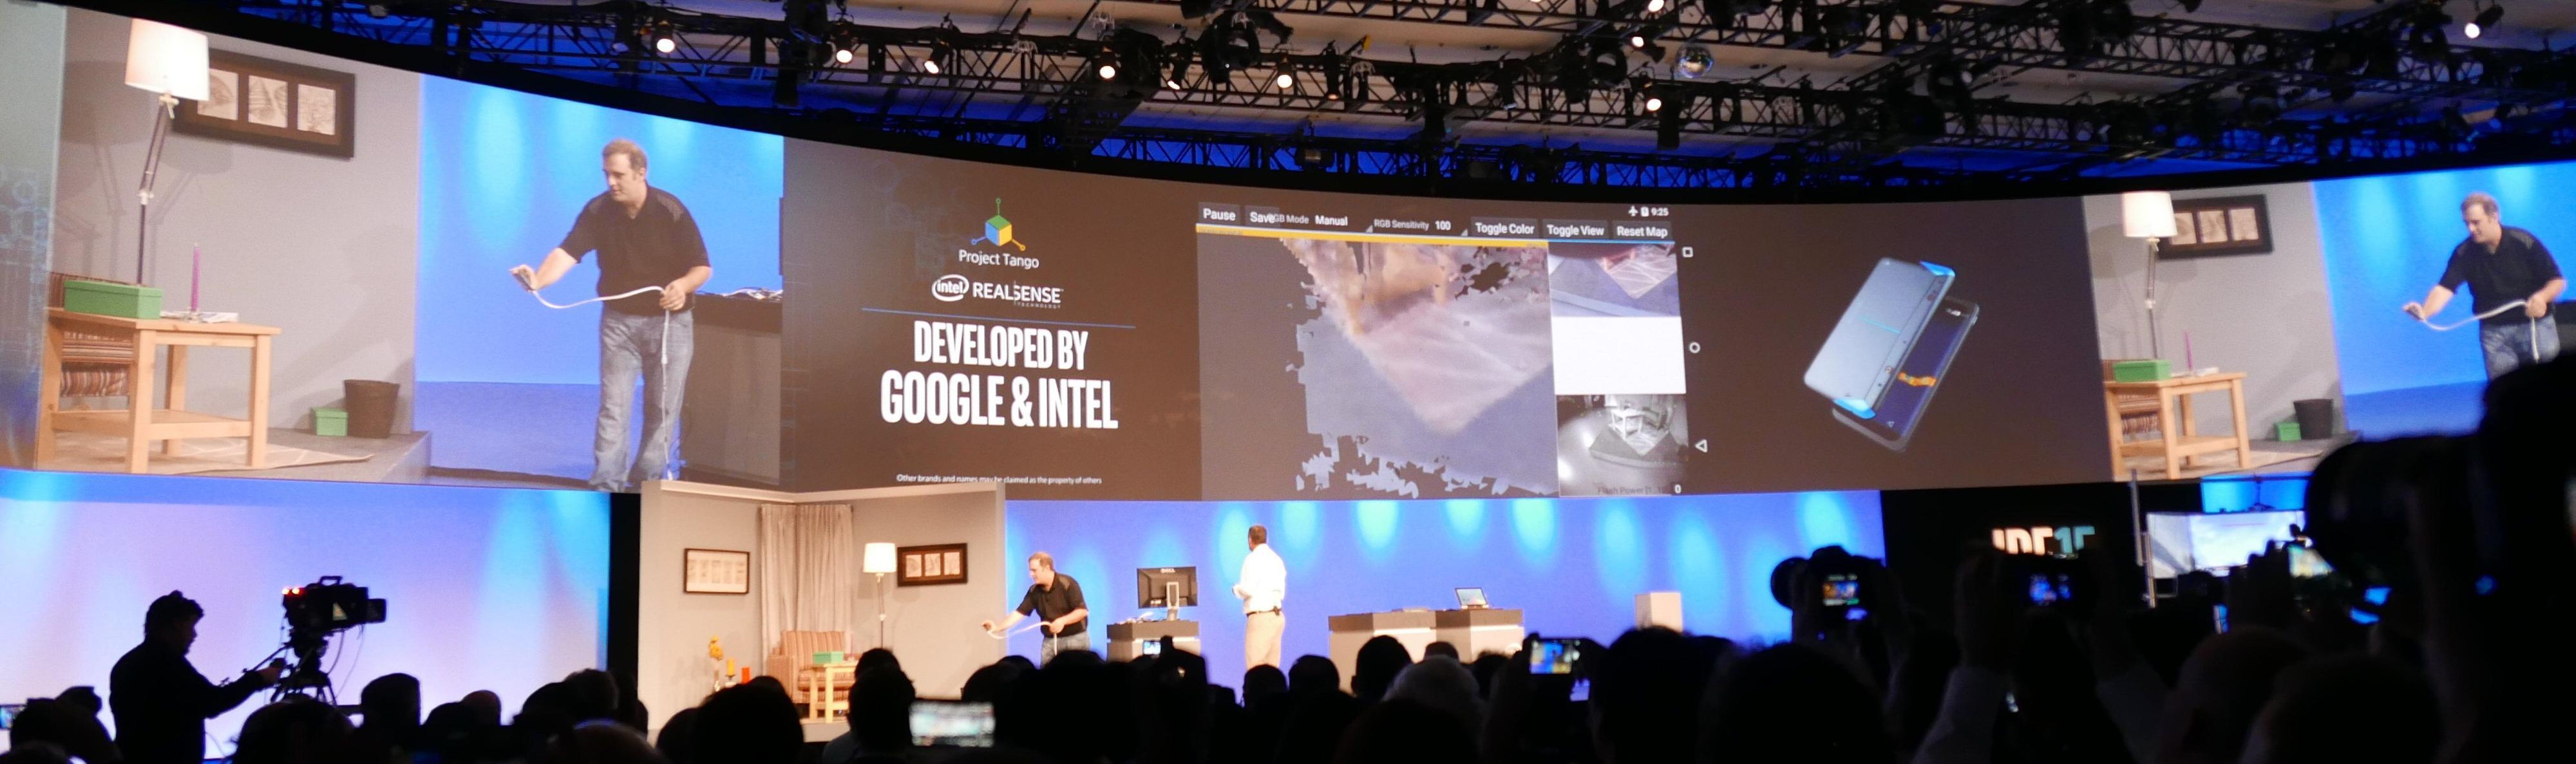 Googles Project Tango med Intel RealSense. Foto: Vegar Jansen, Tek.no